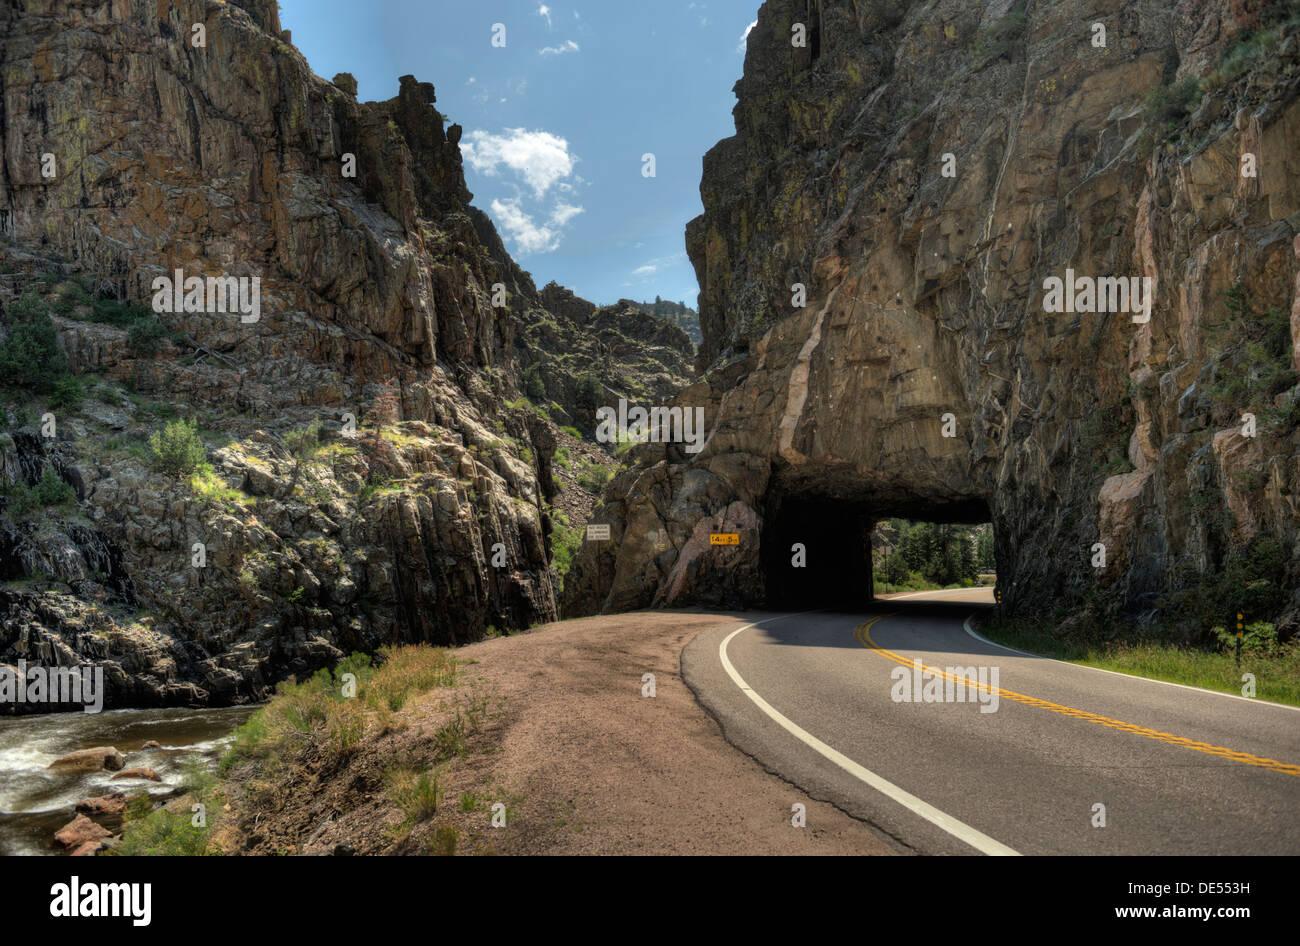 The tunnel at milepost 107, Colorado State Route 14, on the Cache La Poudre River. - Stock Image